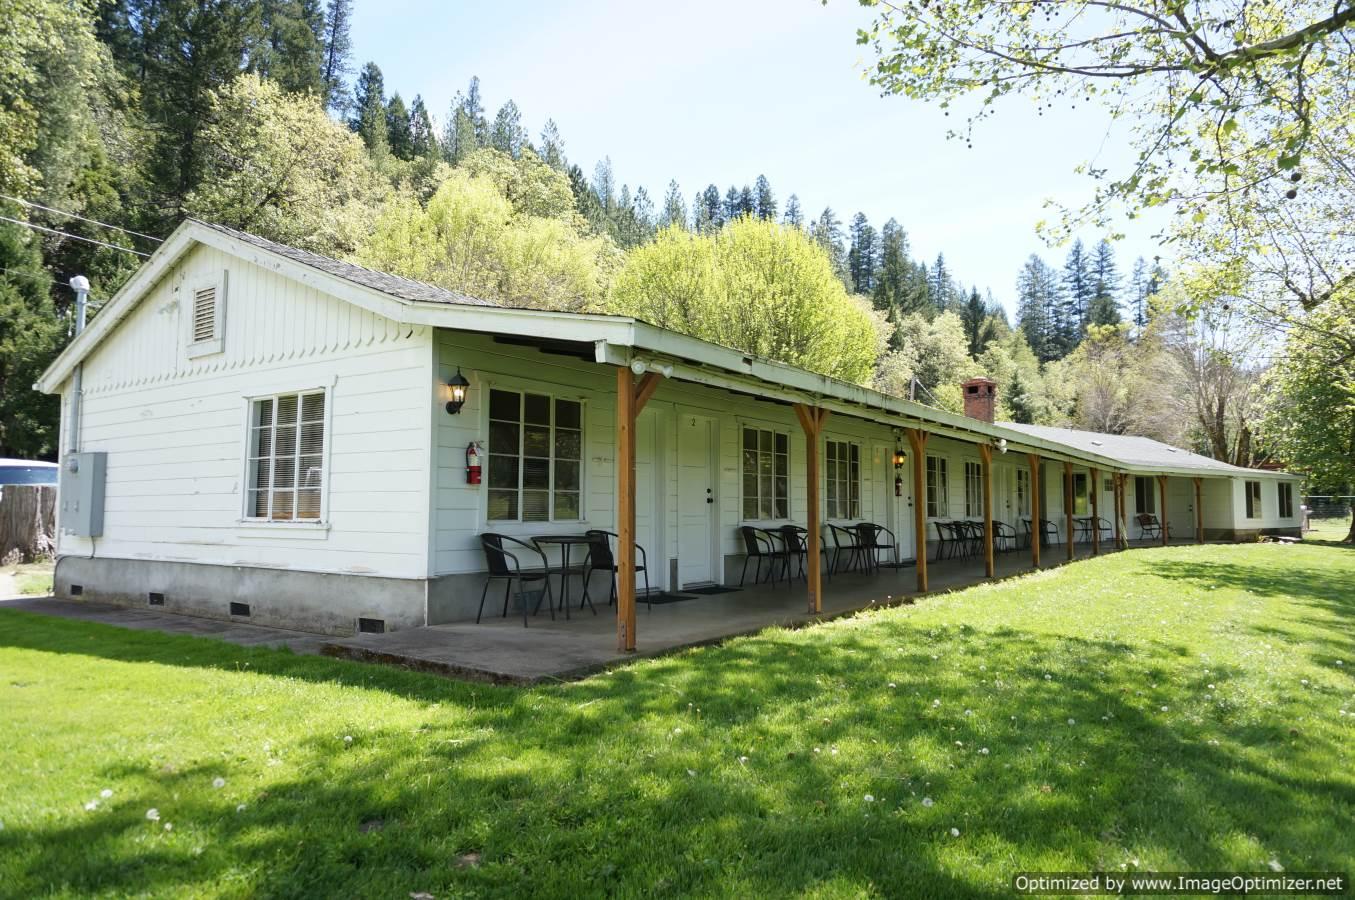 Northern California Riverfront motels for sale Klamath River